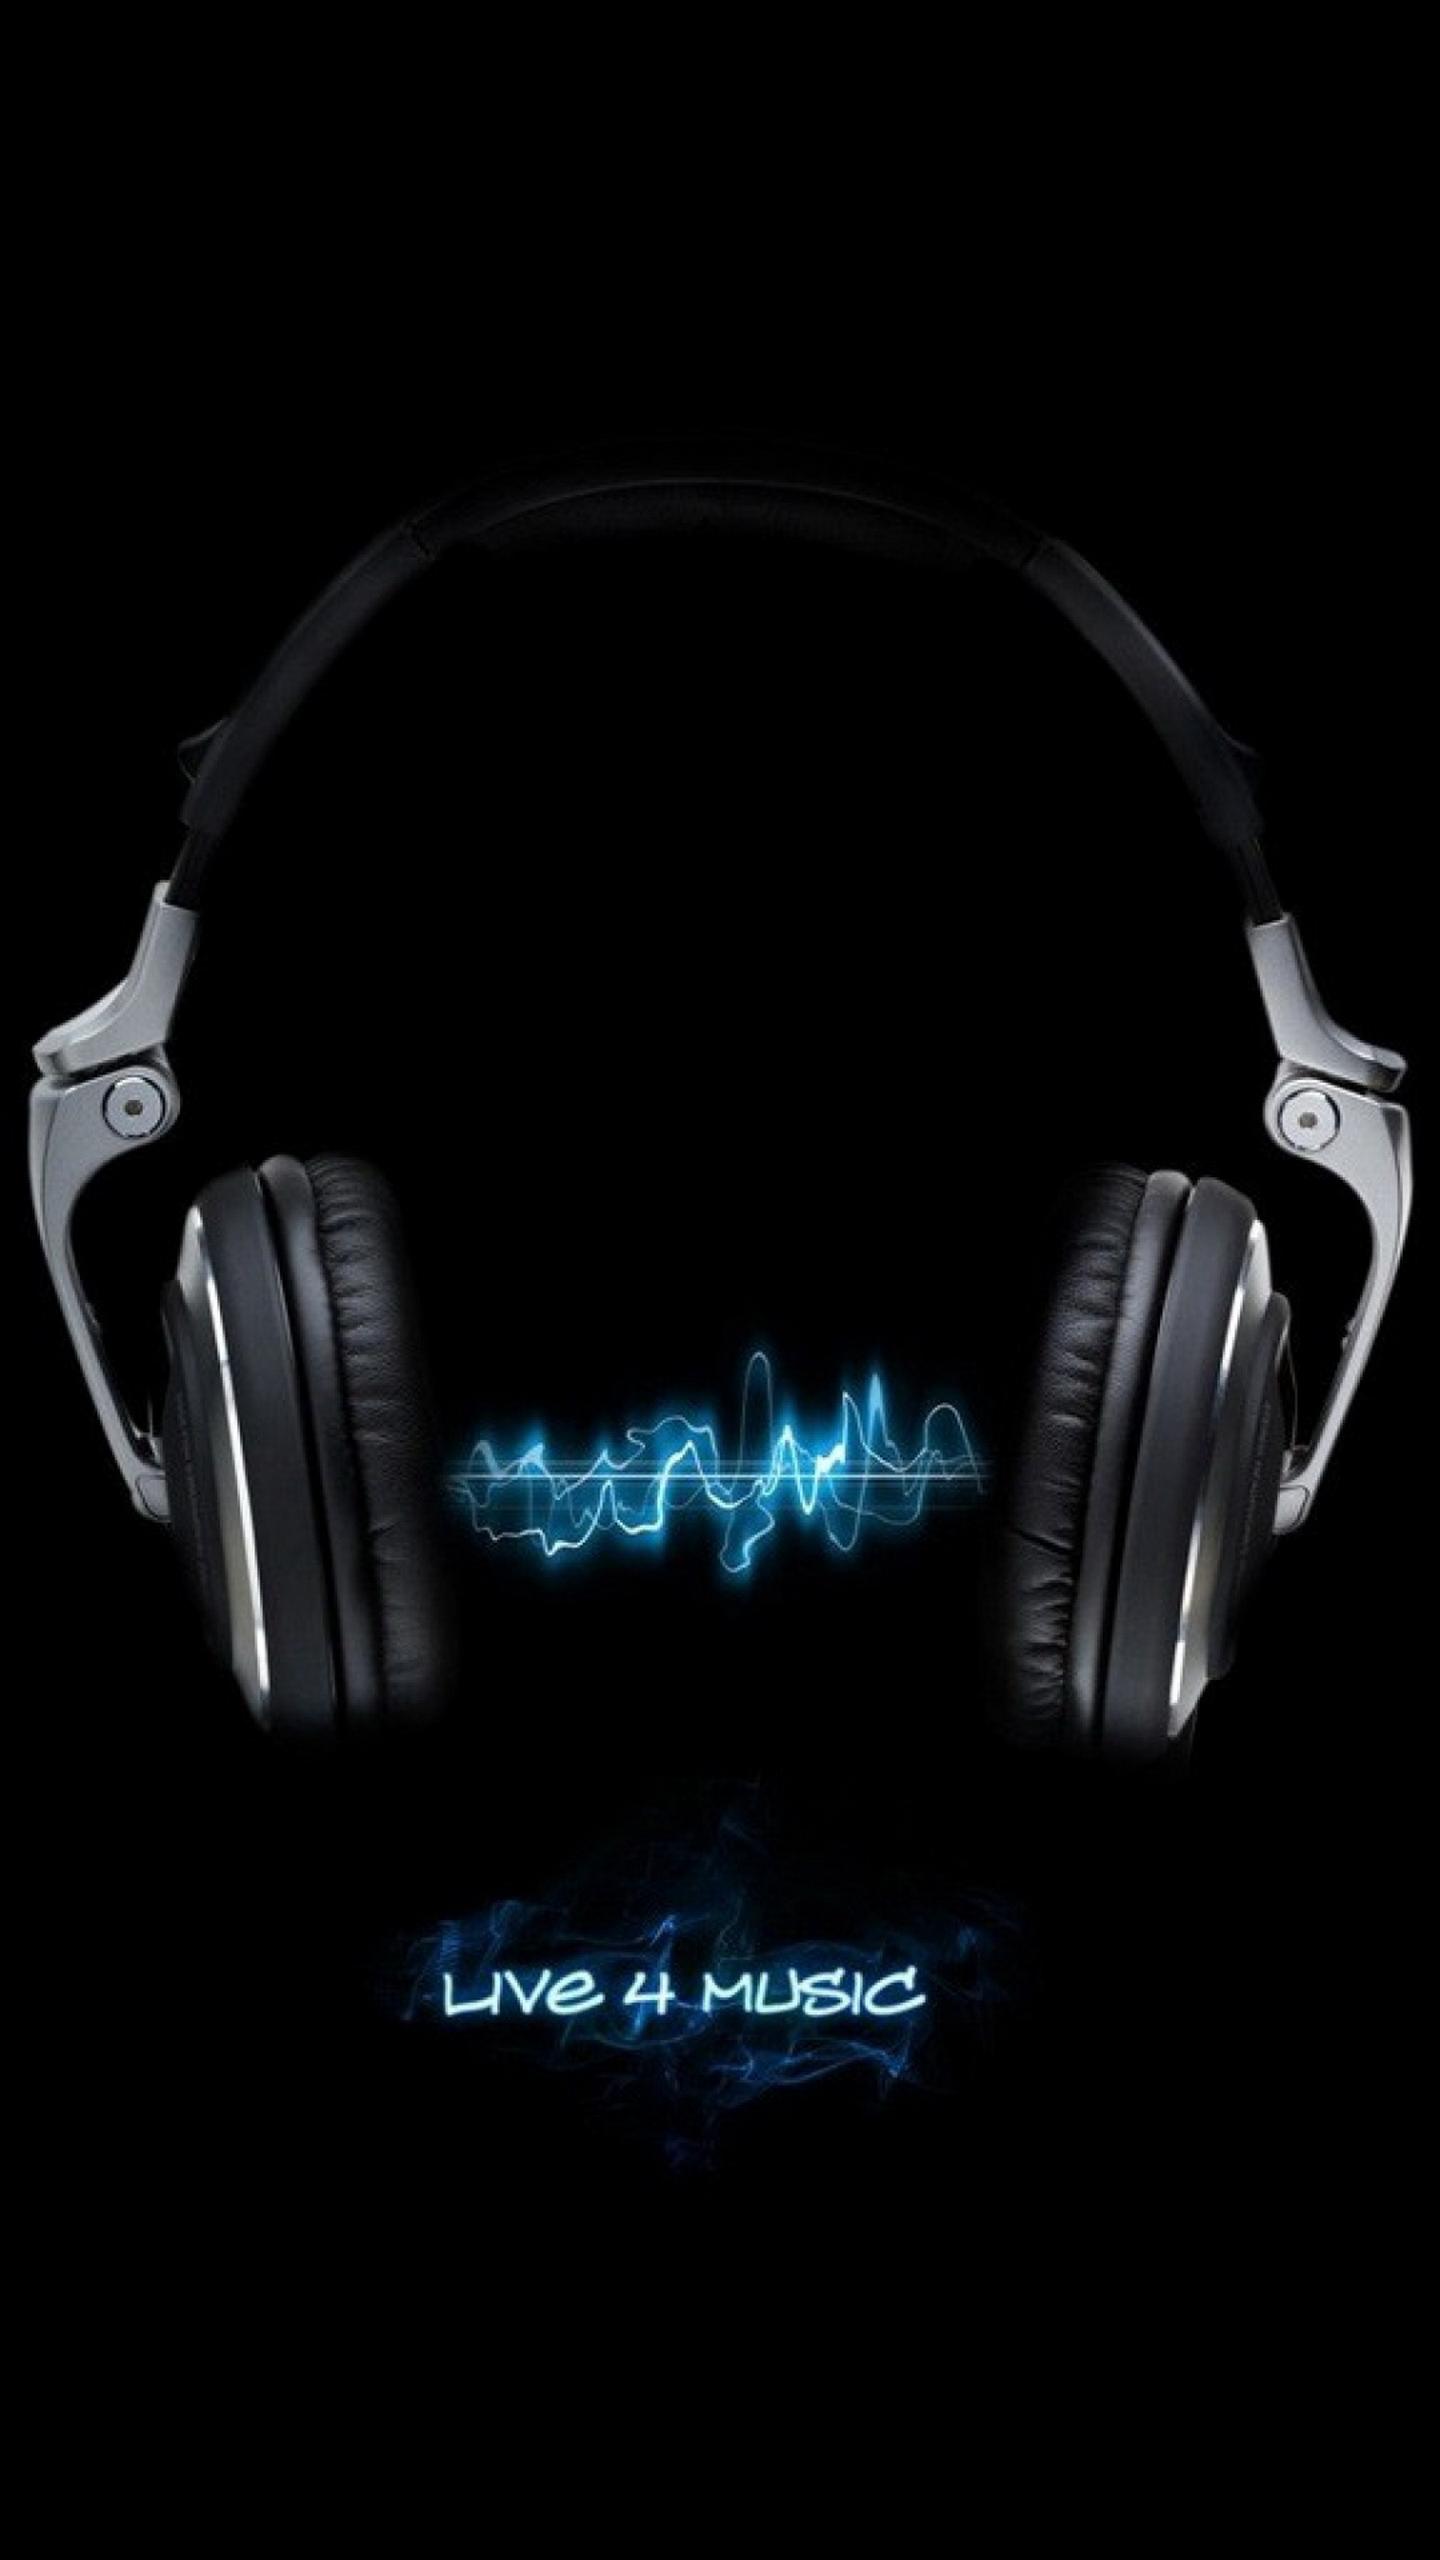 Live For Music Black Neon Blue Galaxy Note 4 Wallpaper Quad HD 1440 1440x2560